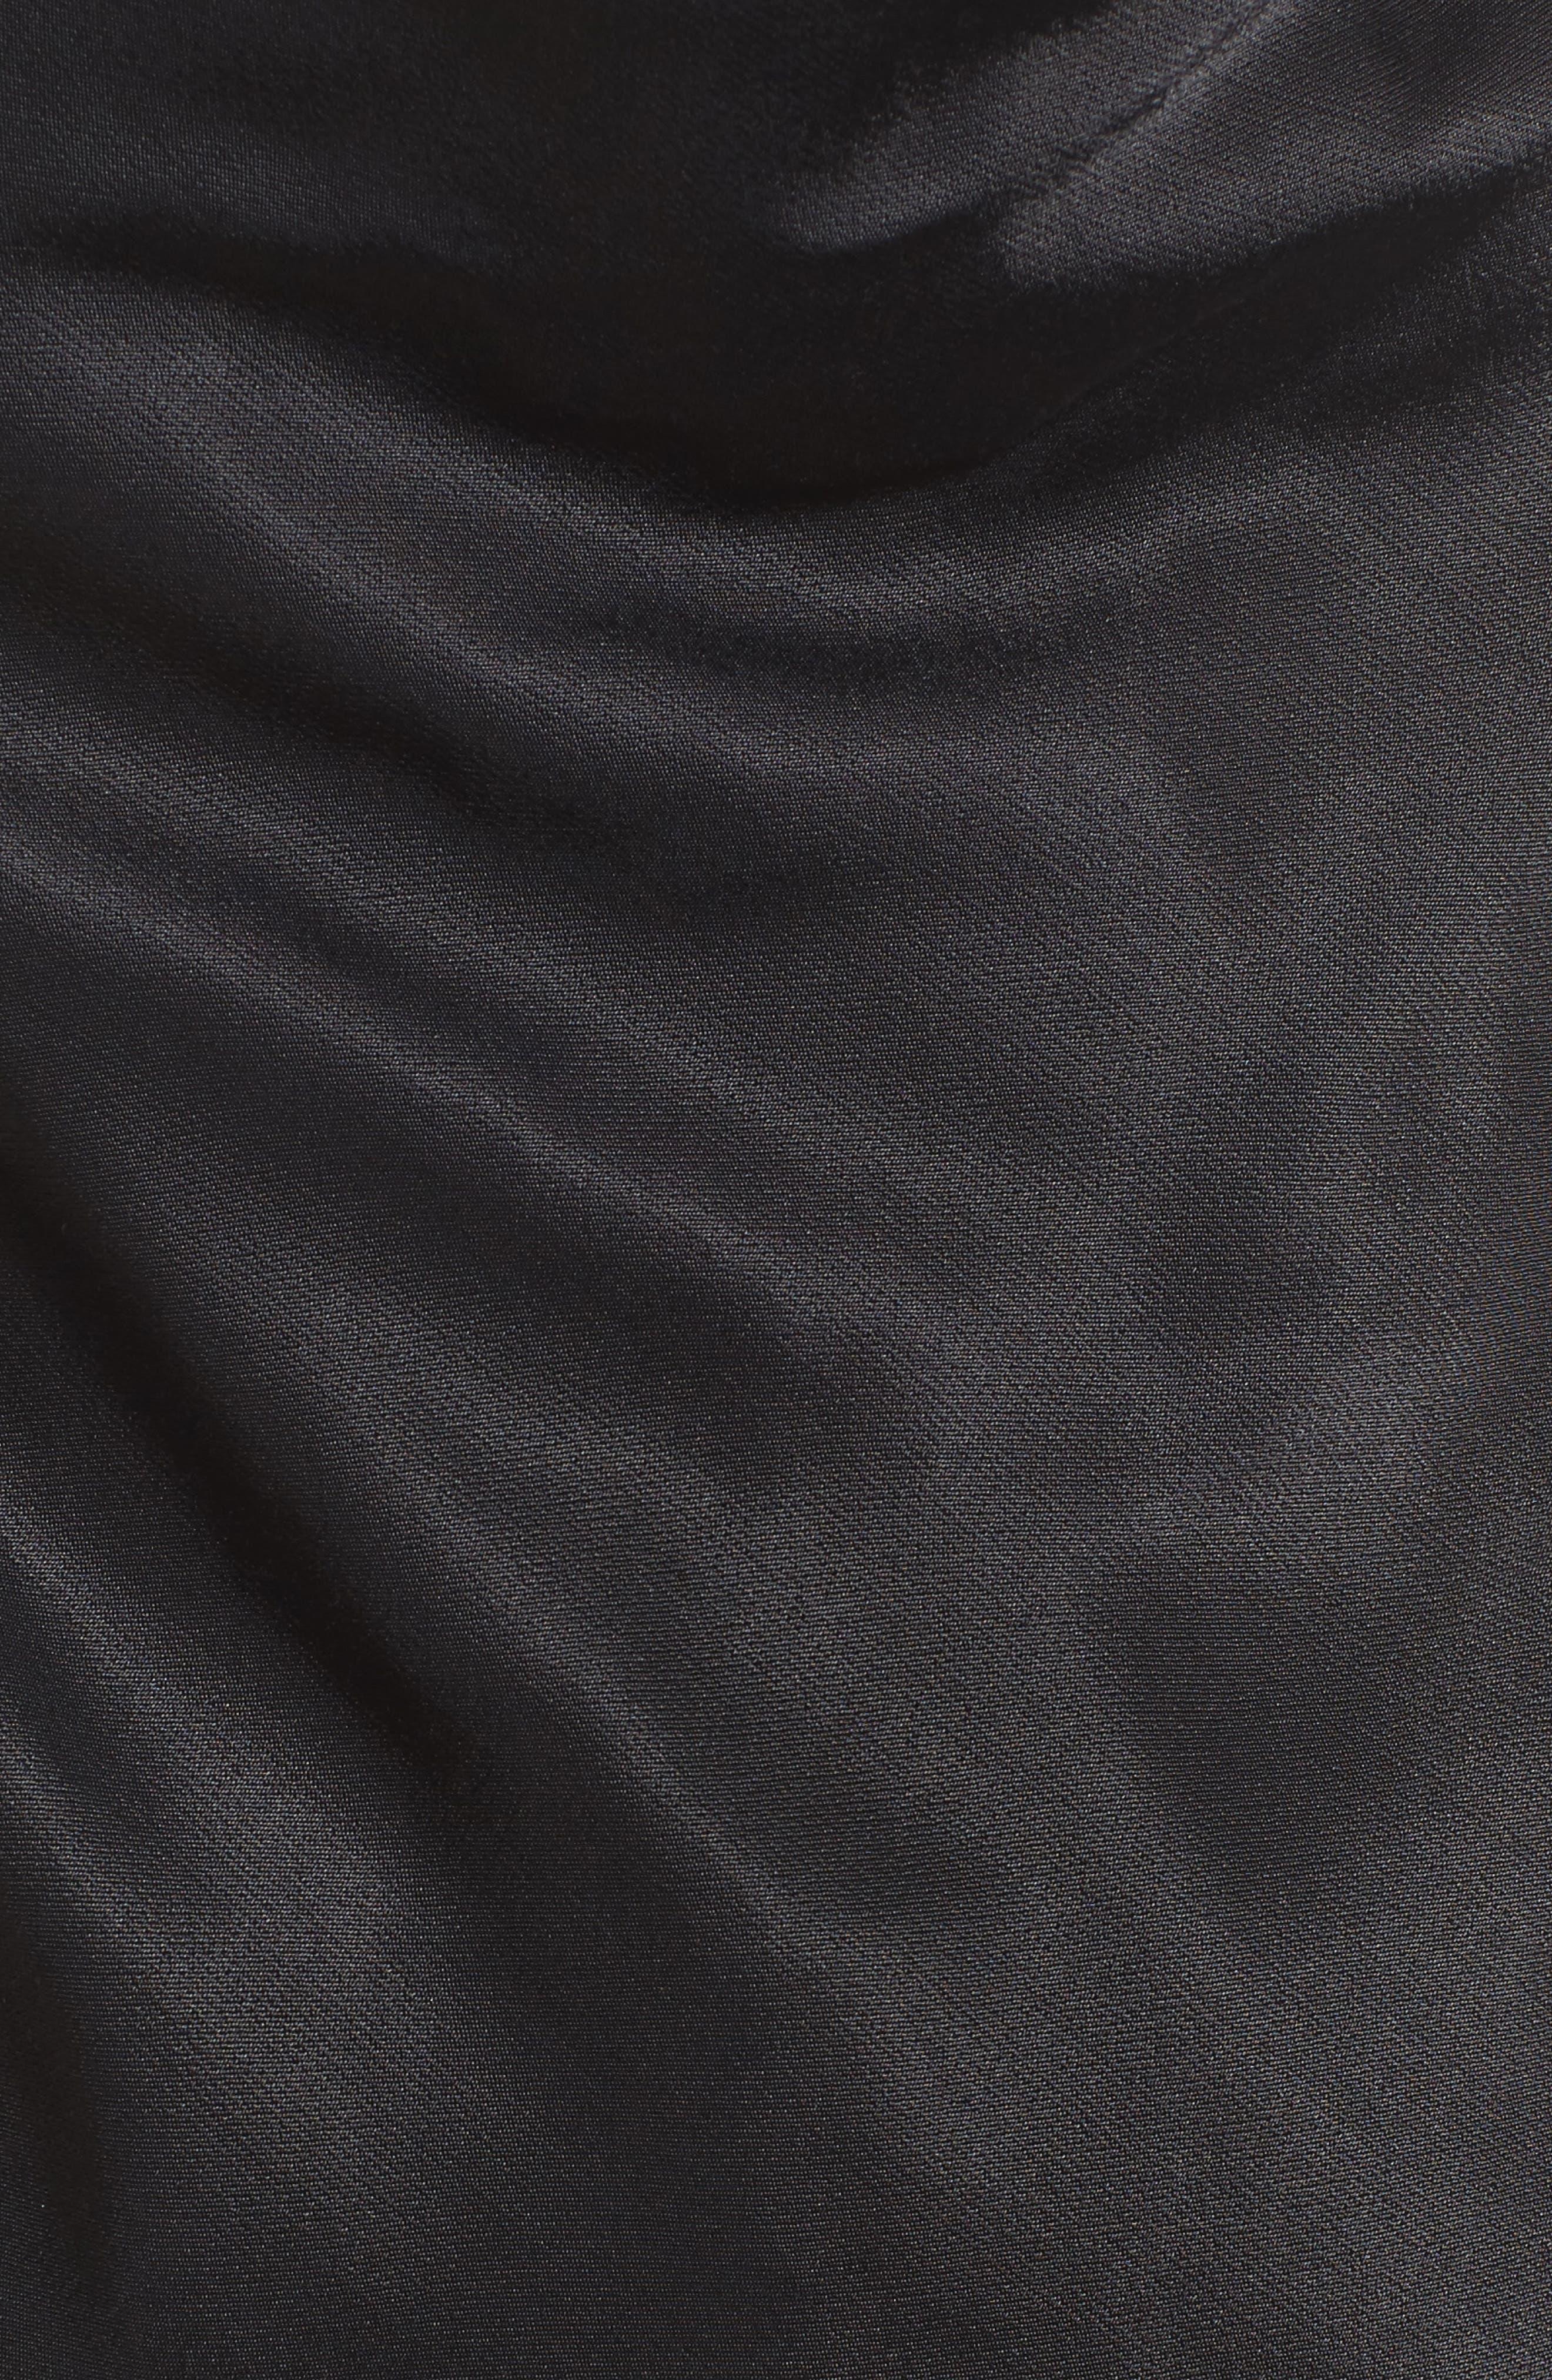 Iggy Chain Cowl Neck Tank,                             Alternate thumbnail 5, color,